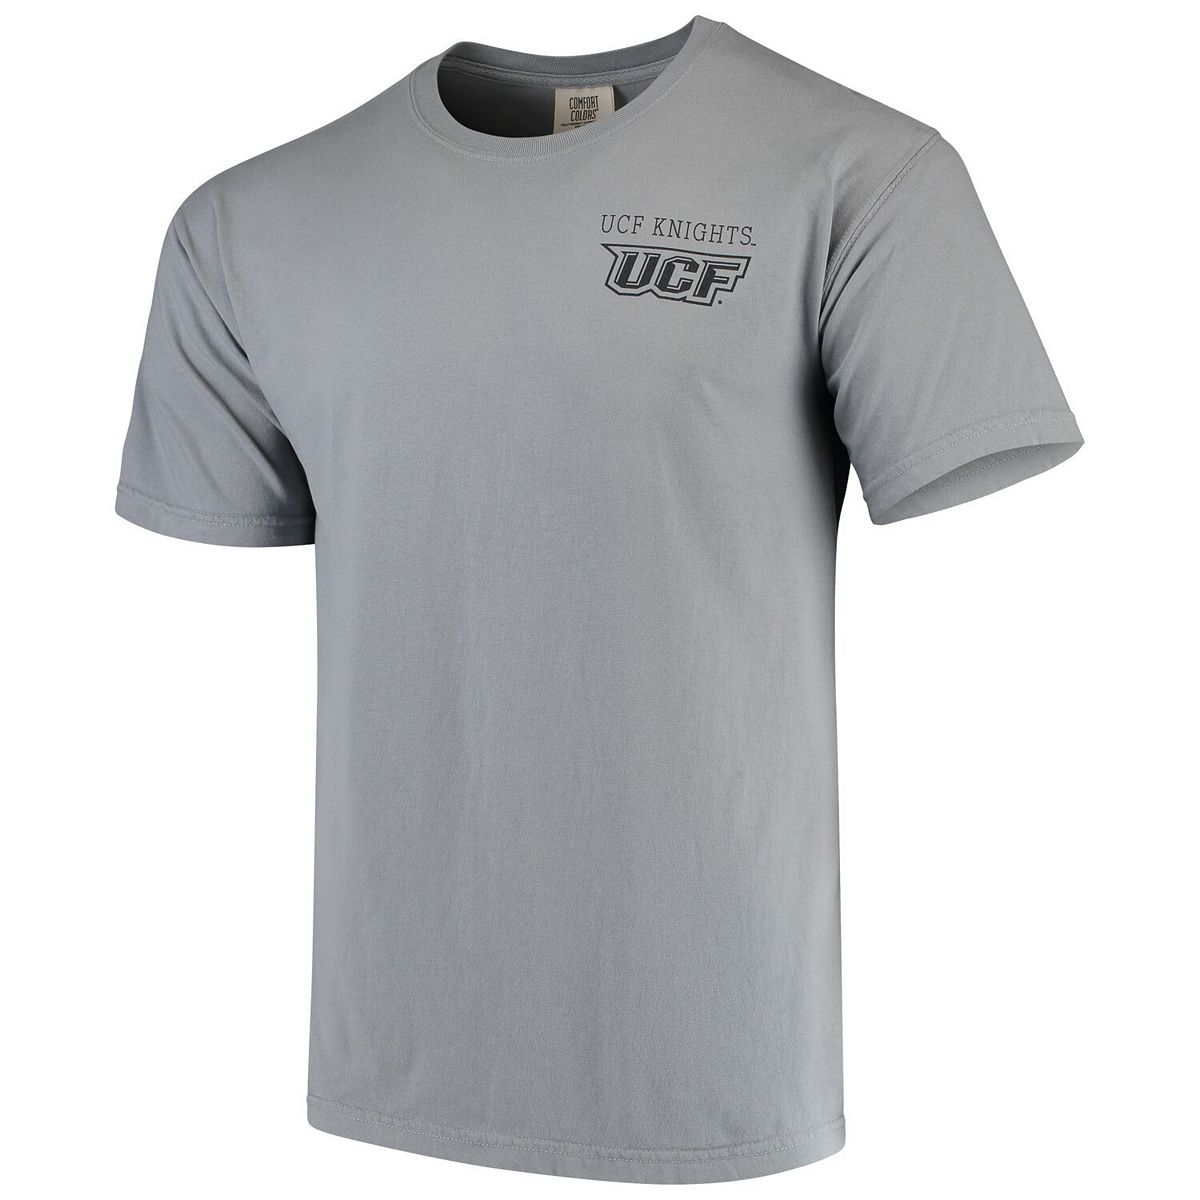 Men's Gray UCF Knights Team Comfort Colors Campus Scenery T-Shirt dV2hR